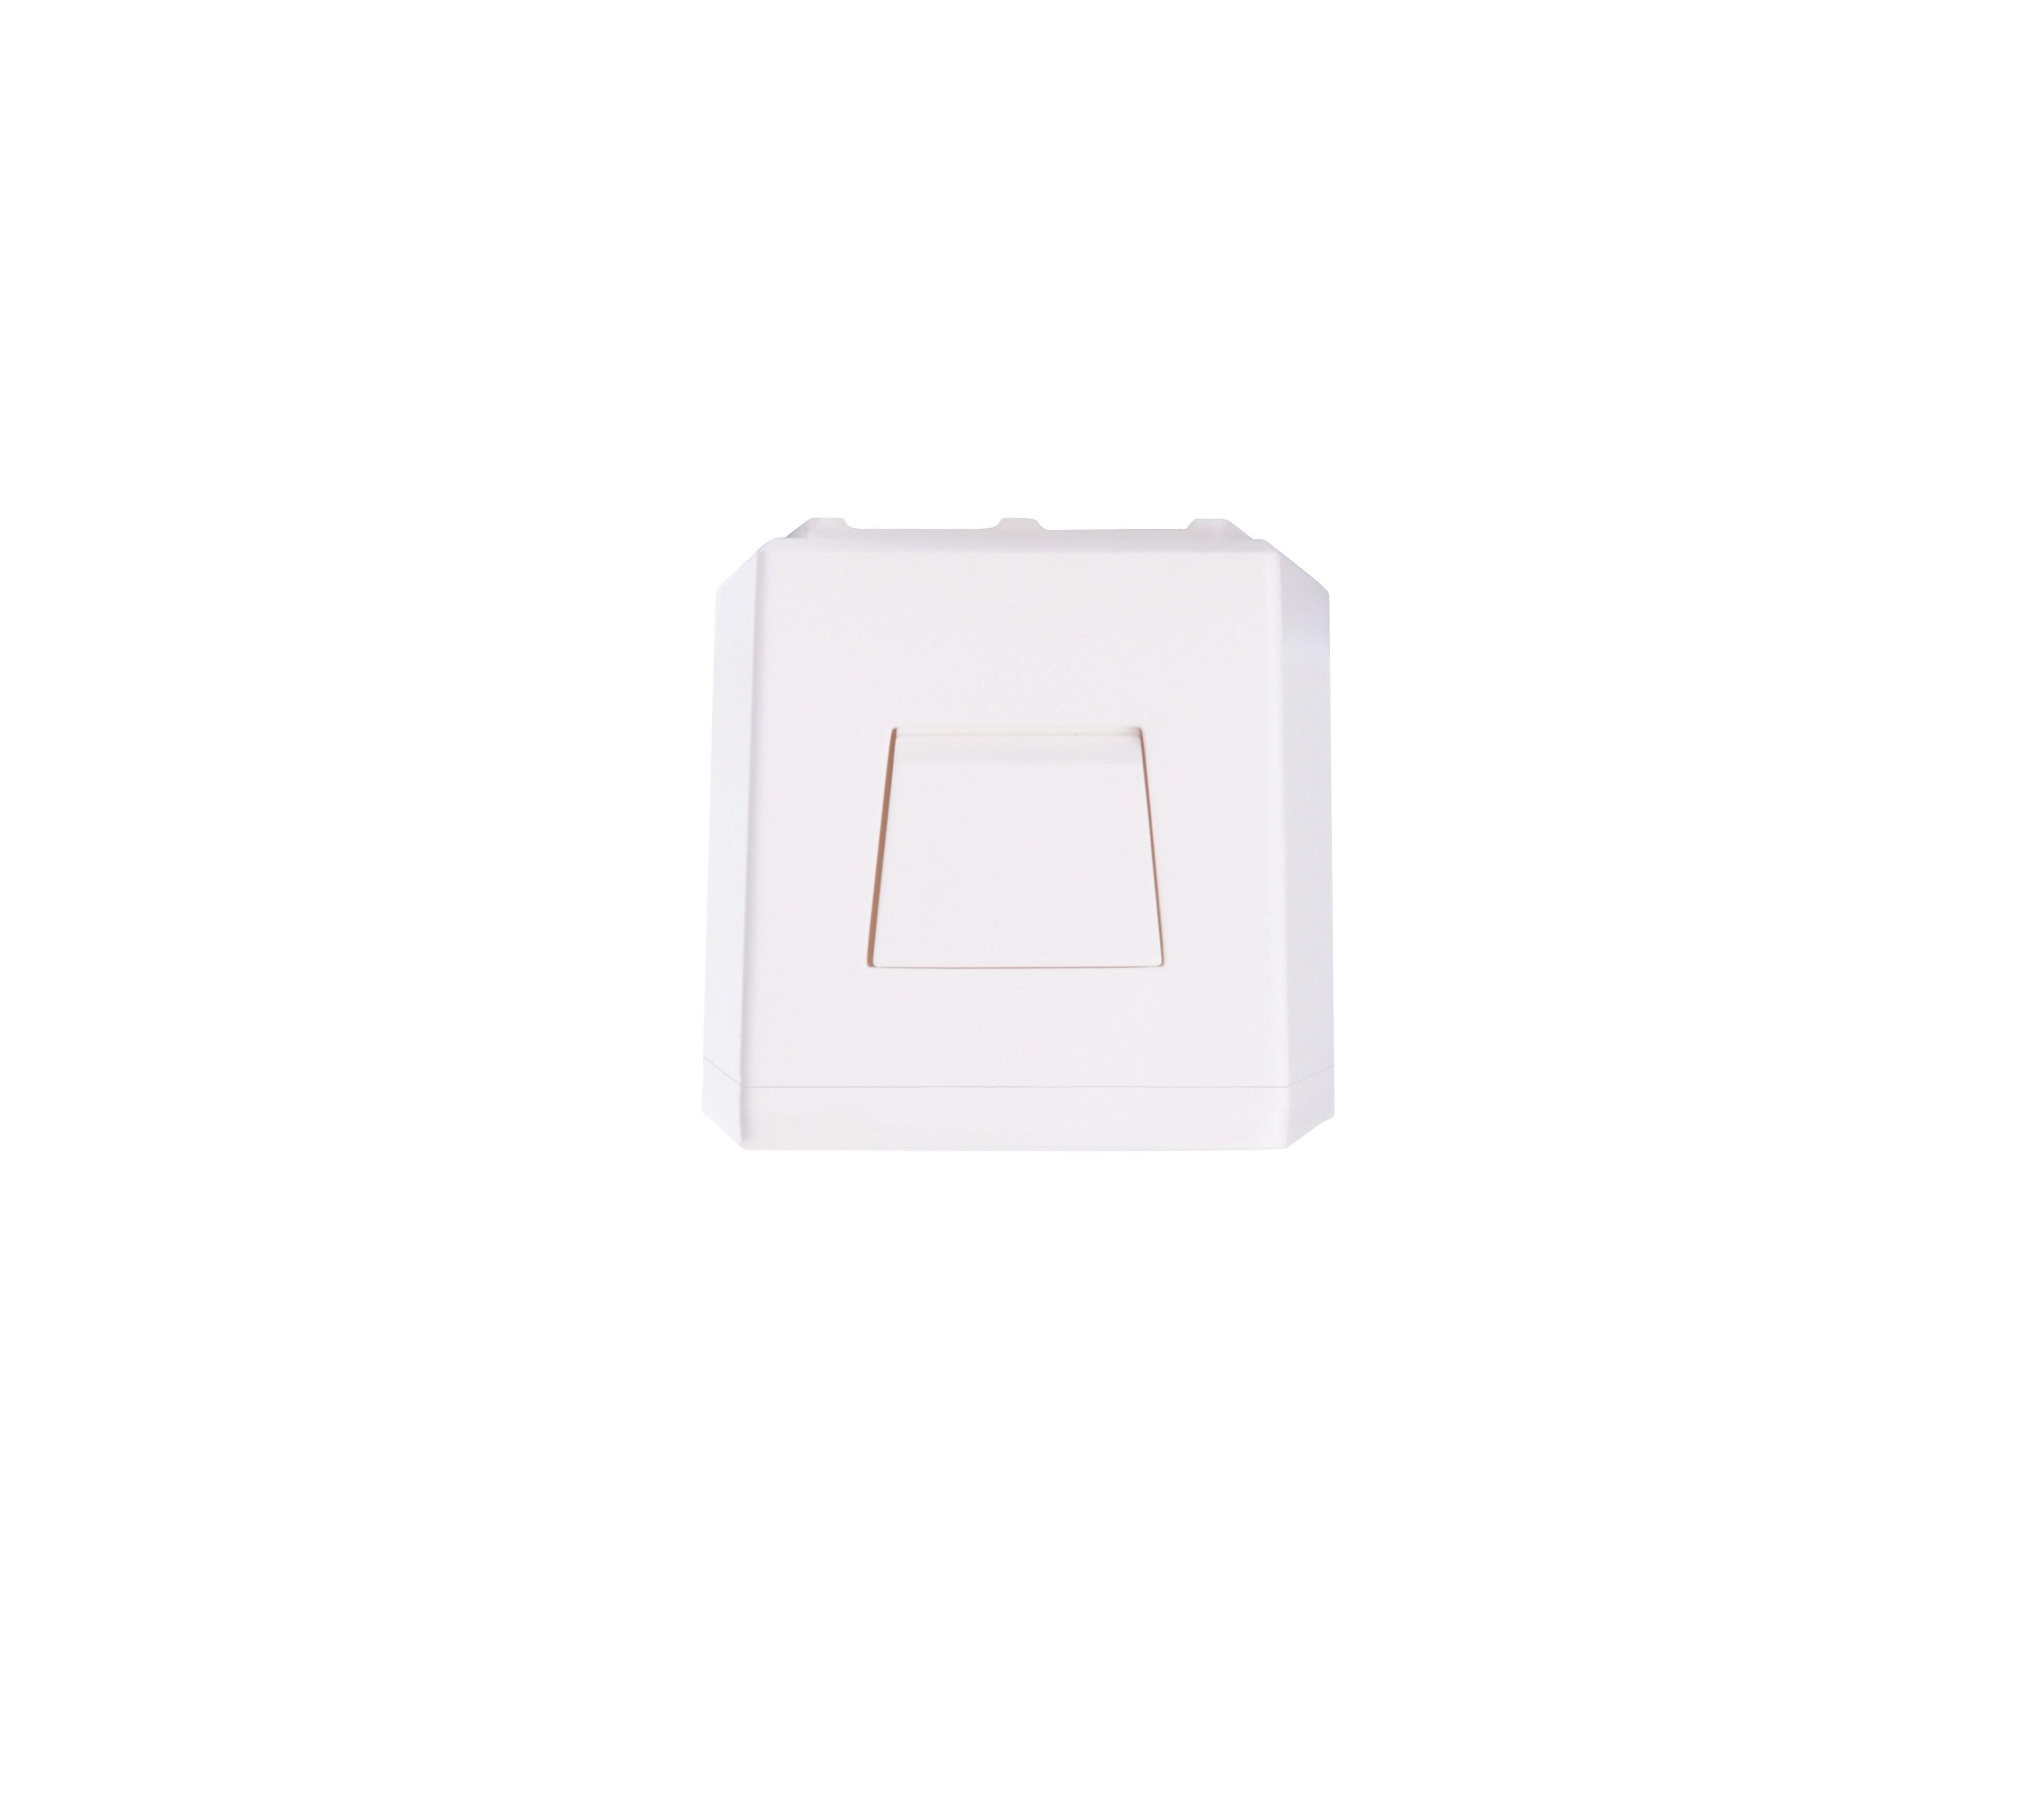 Lampa antipanica led Intelight 94710   3h mentinut test automat 1